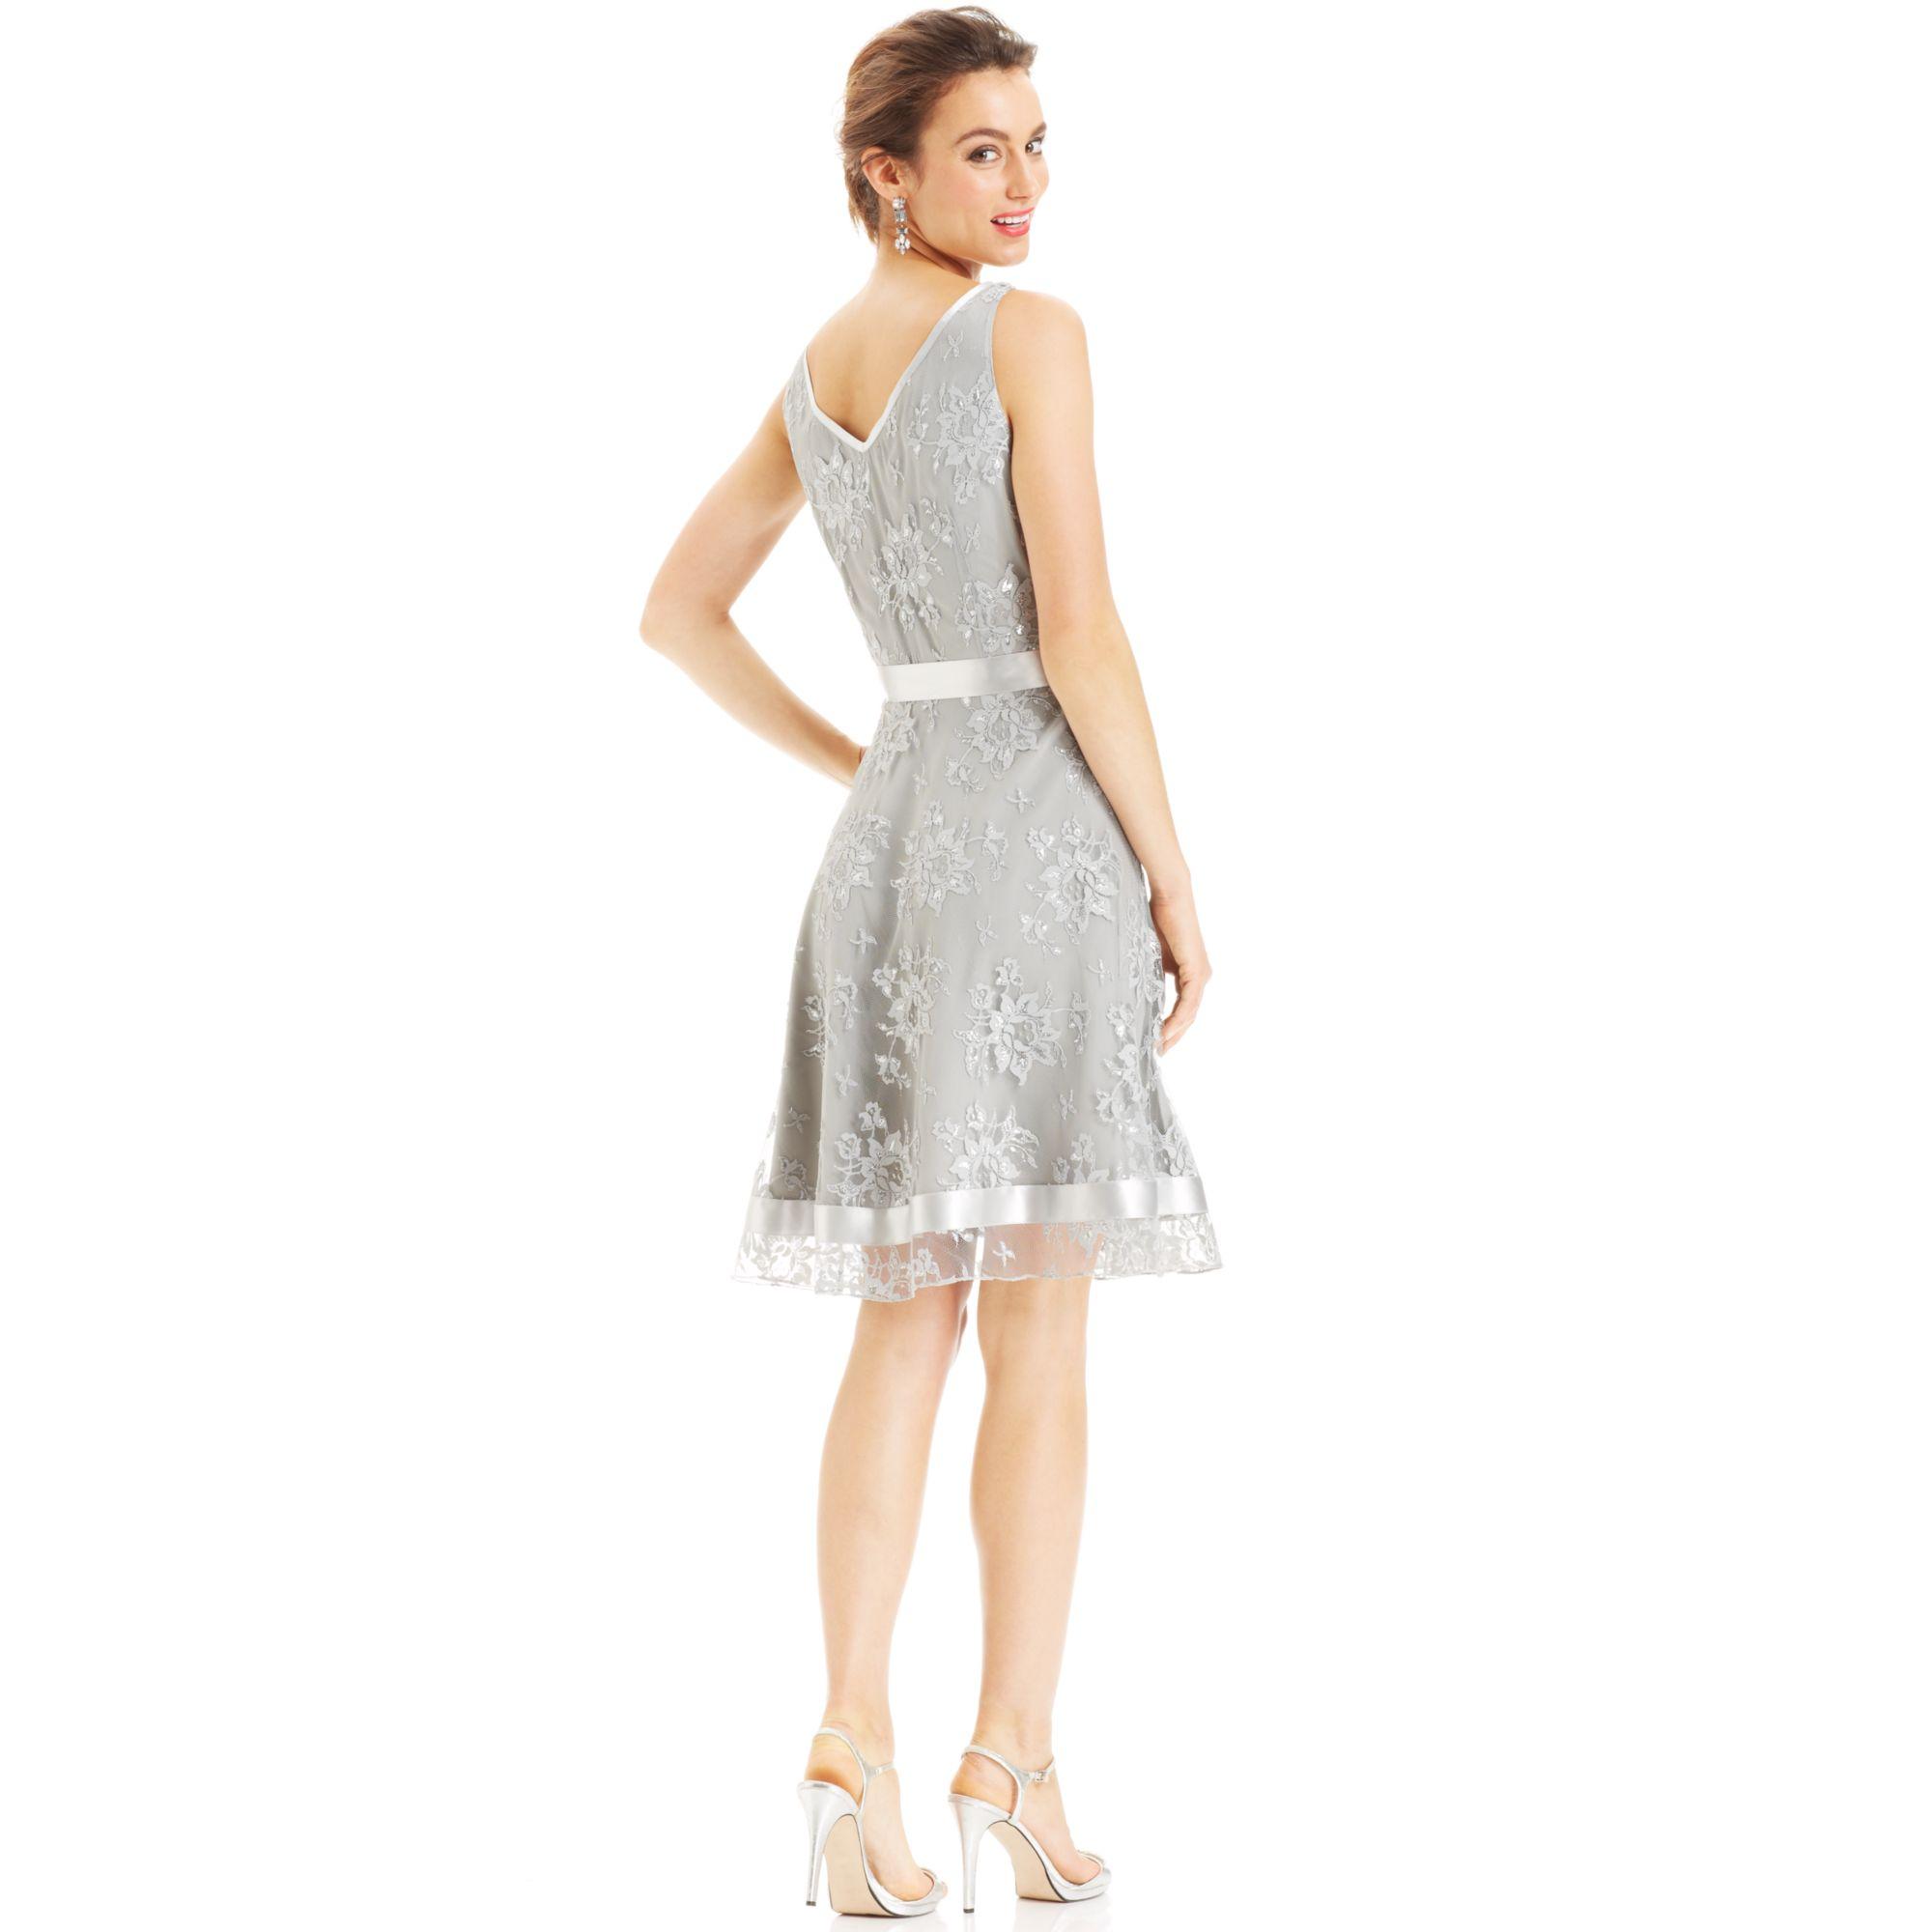 2a9873b3 Tahari By Asl Sleeveless Metallic Lace Belted Dress in Metallic - Lyst